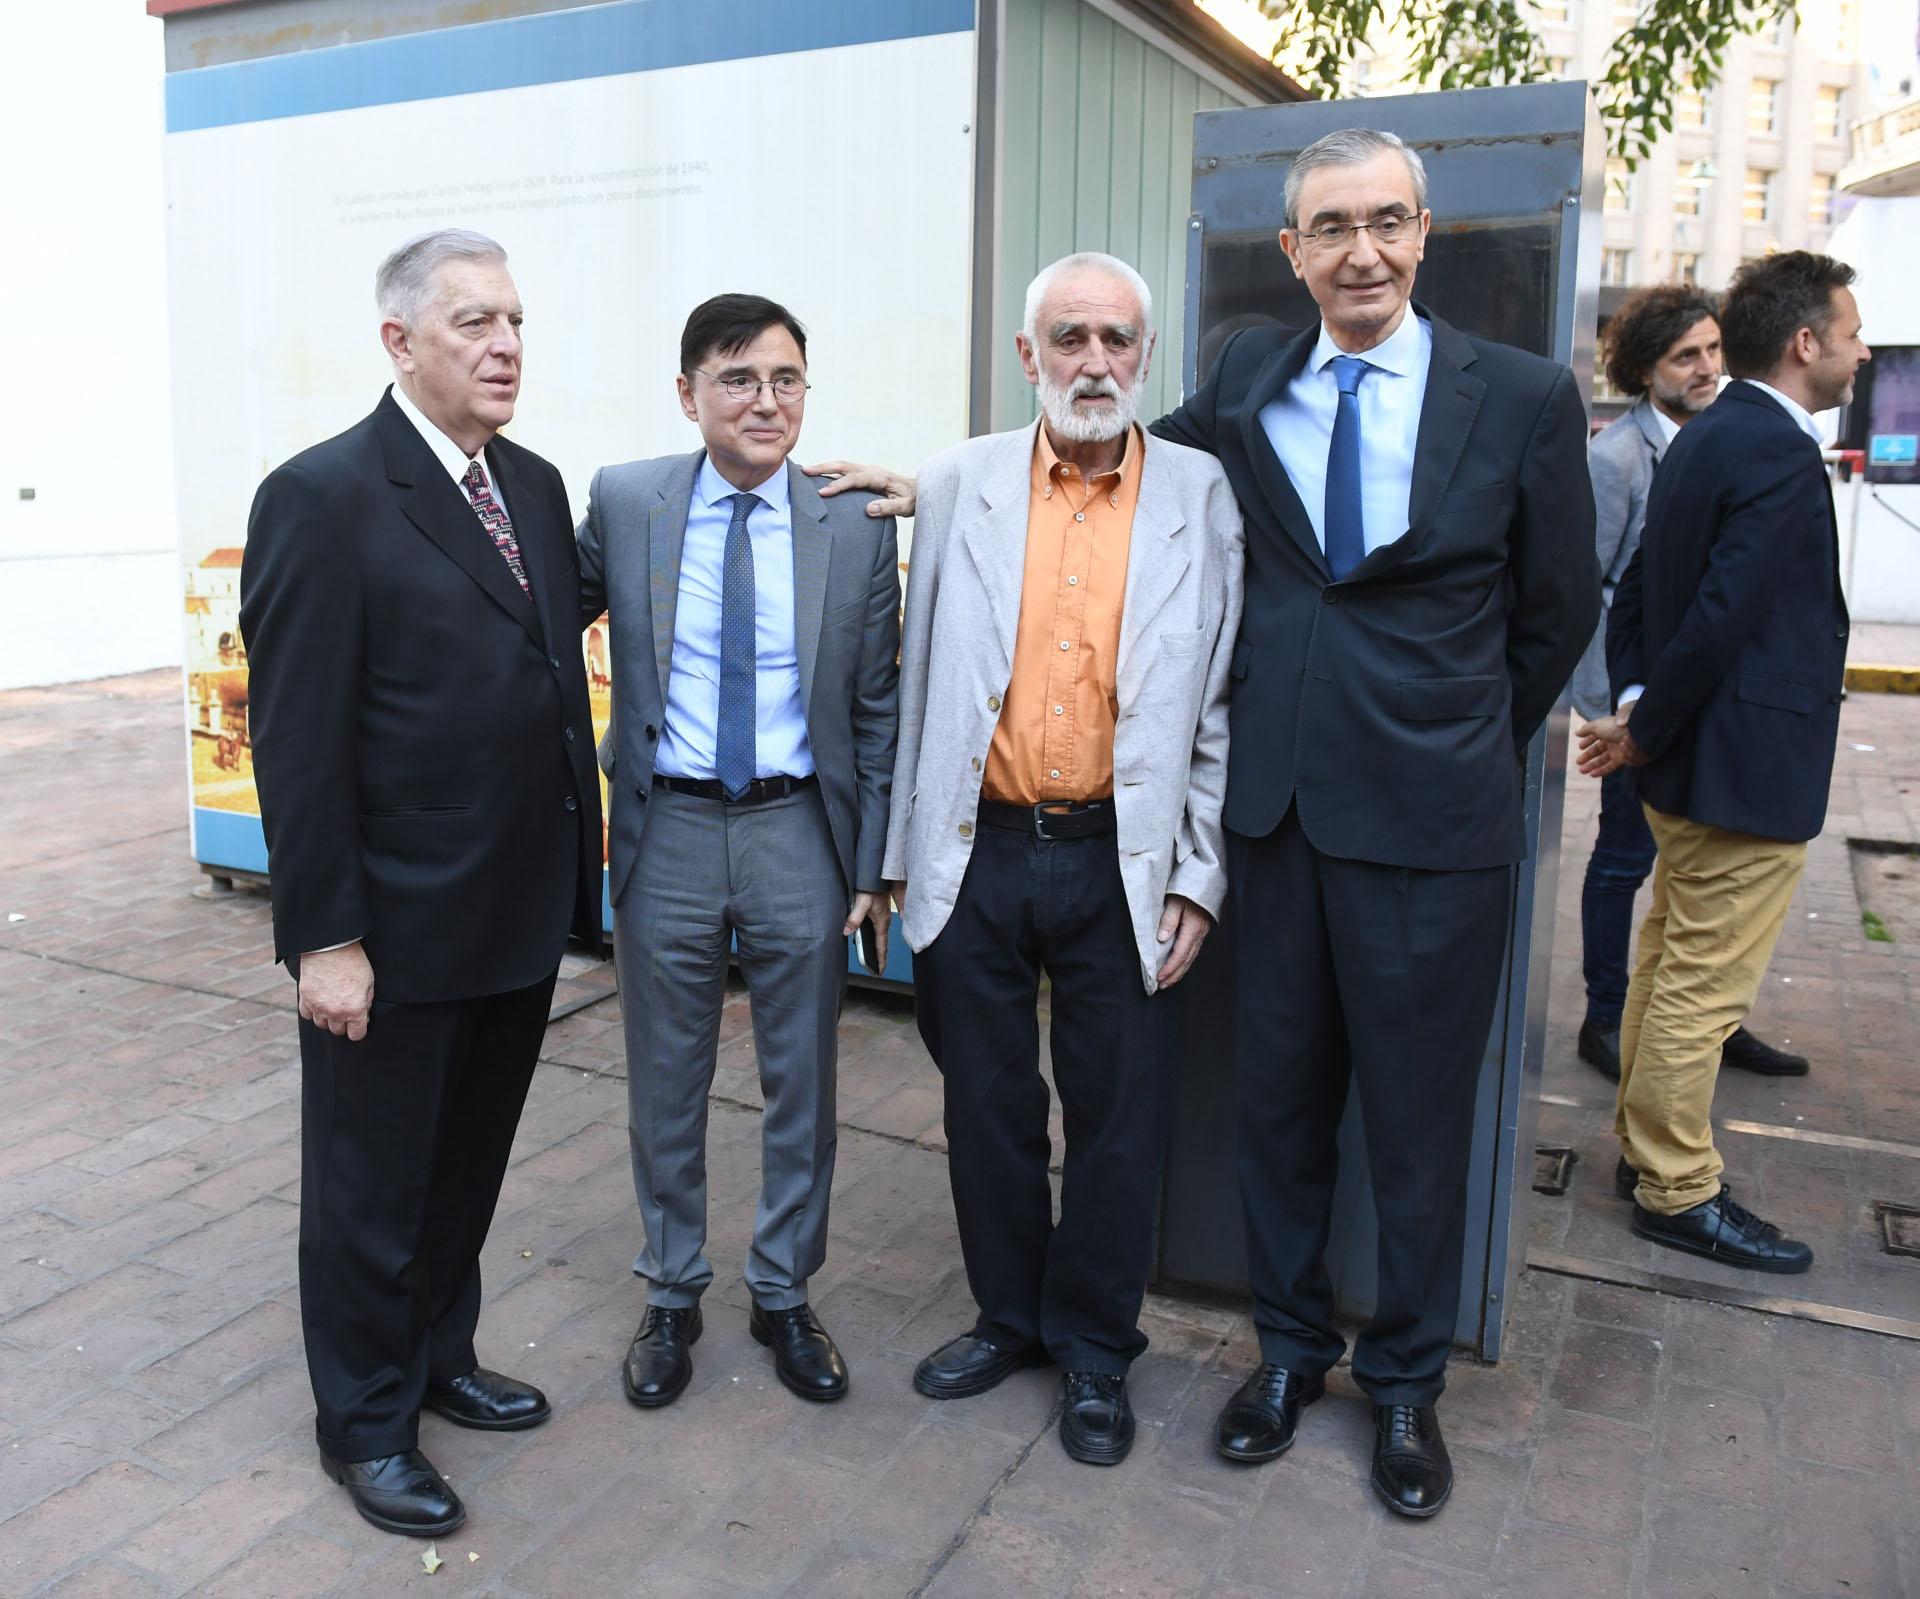 Biasatti, Fontevecchia, Graham-Yooll y Nelson Castro